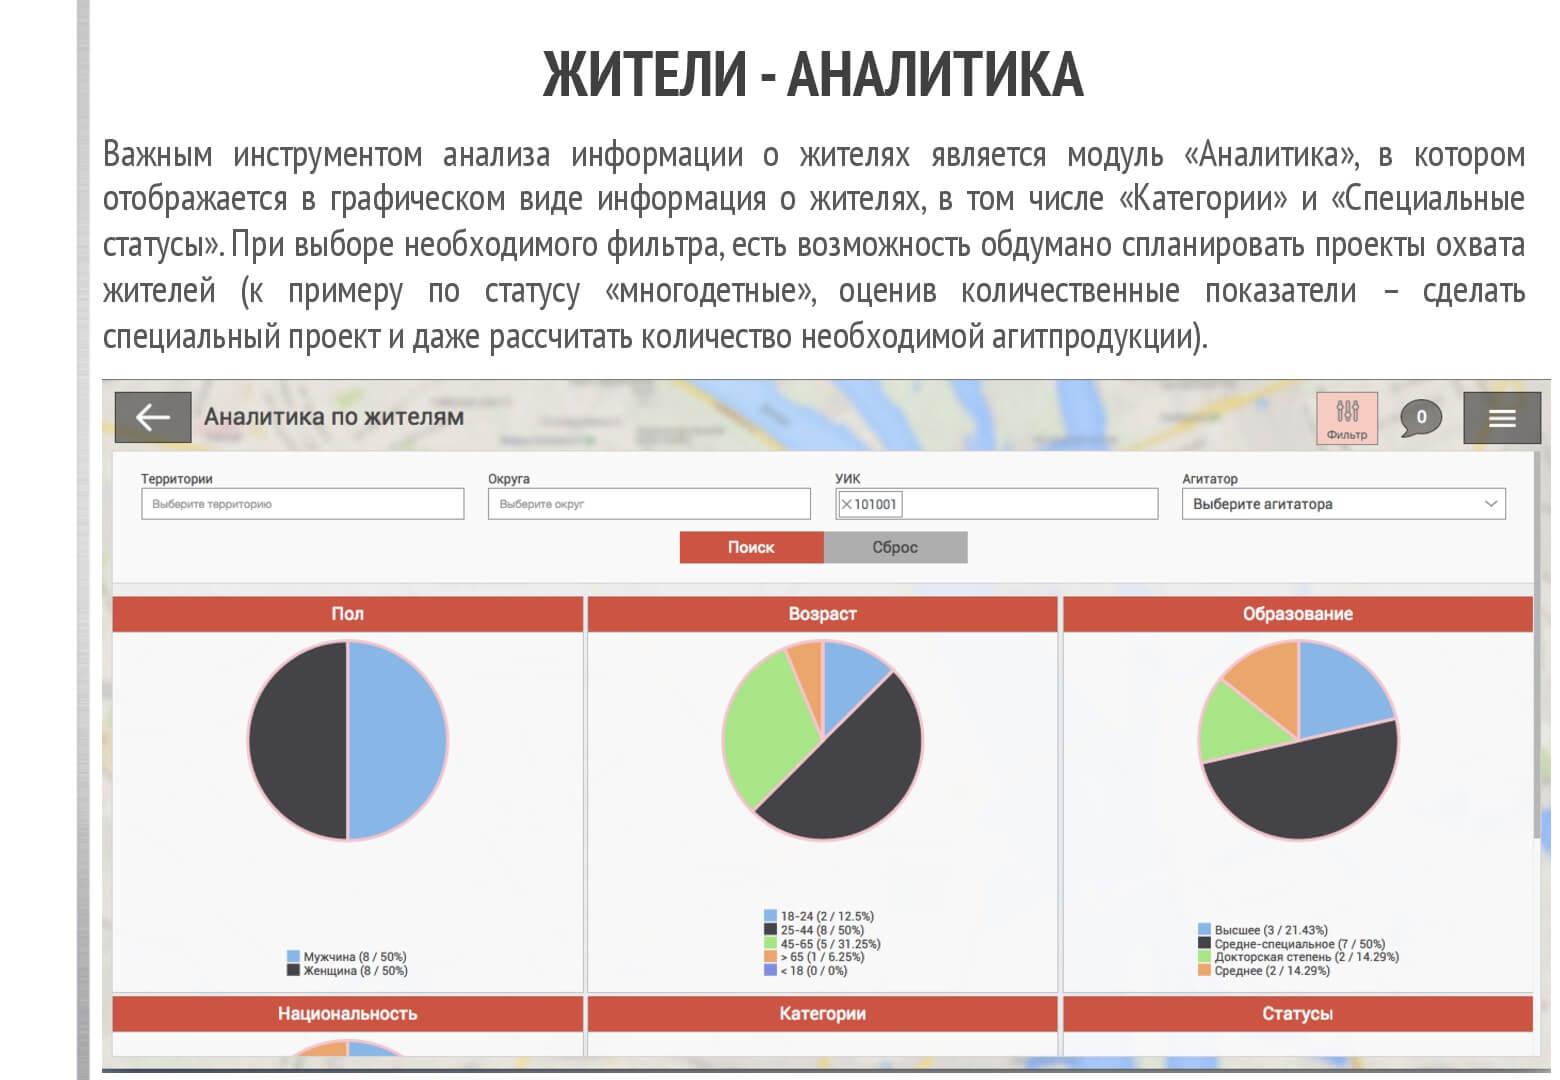 Elect.pro-BG-UA-006